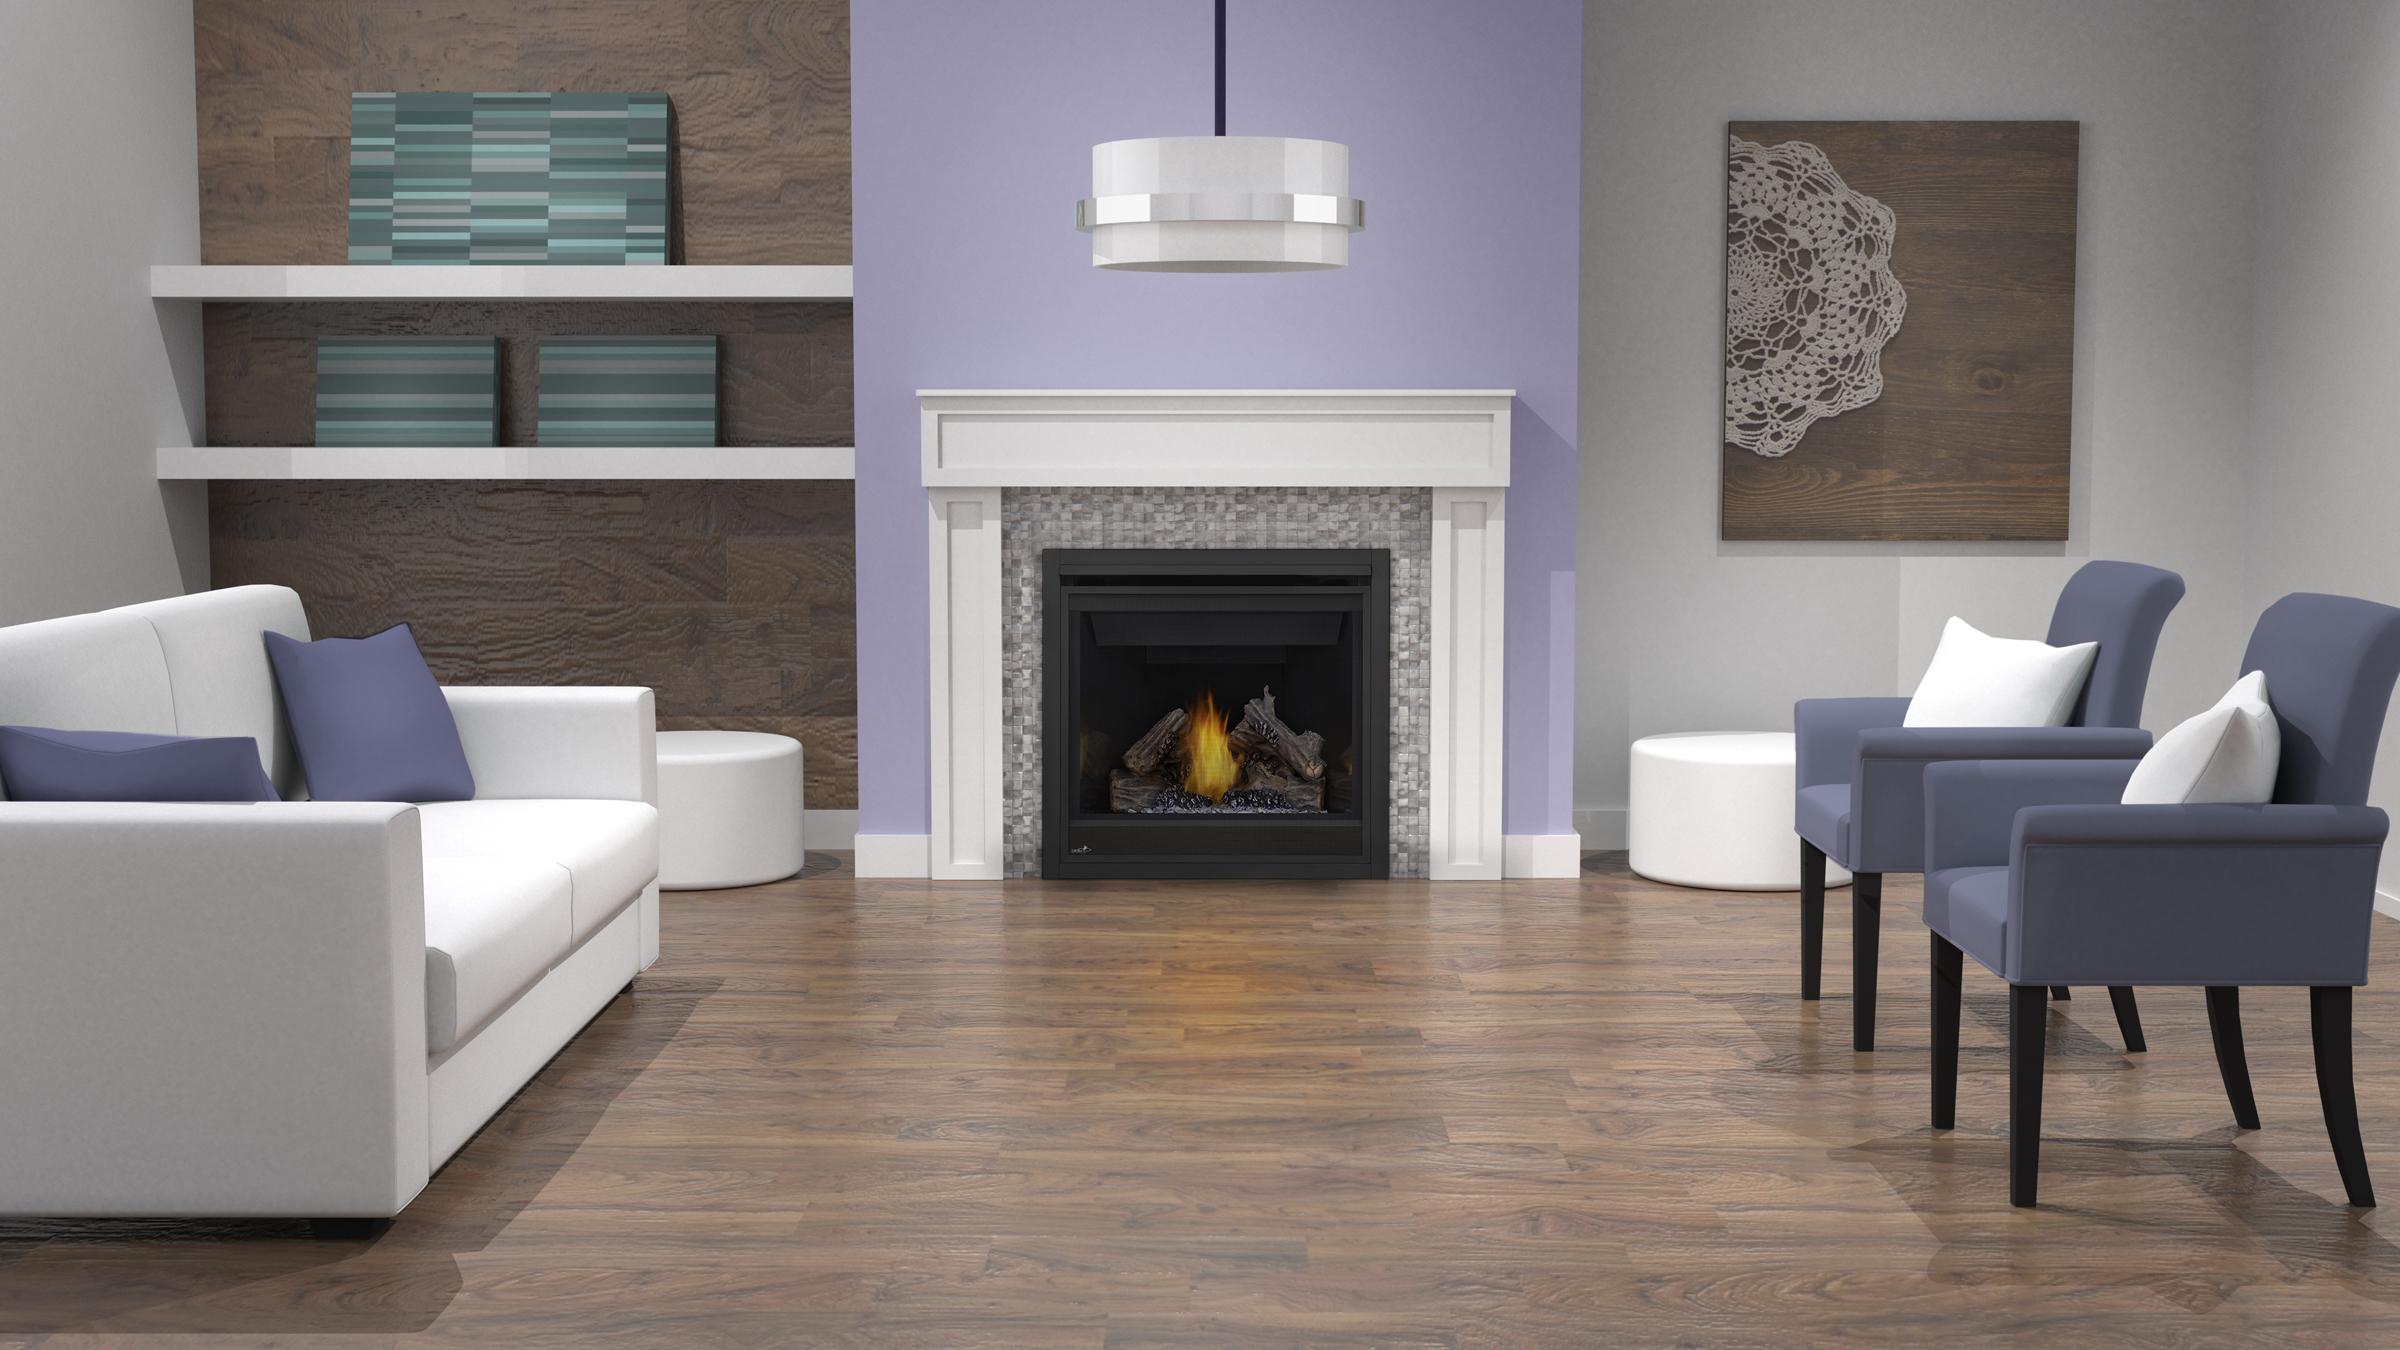 CB36-roomset-prrp-logs-continental-fireplaces (1).jpg